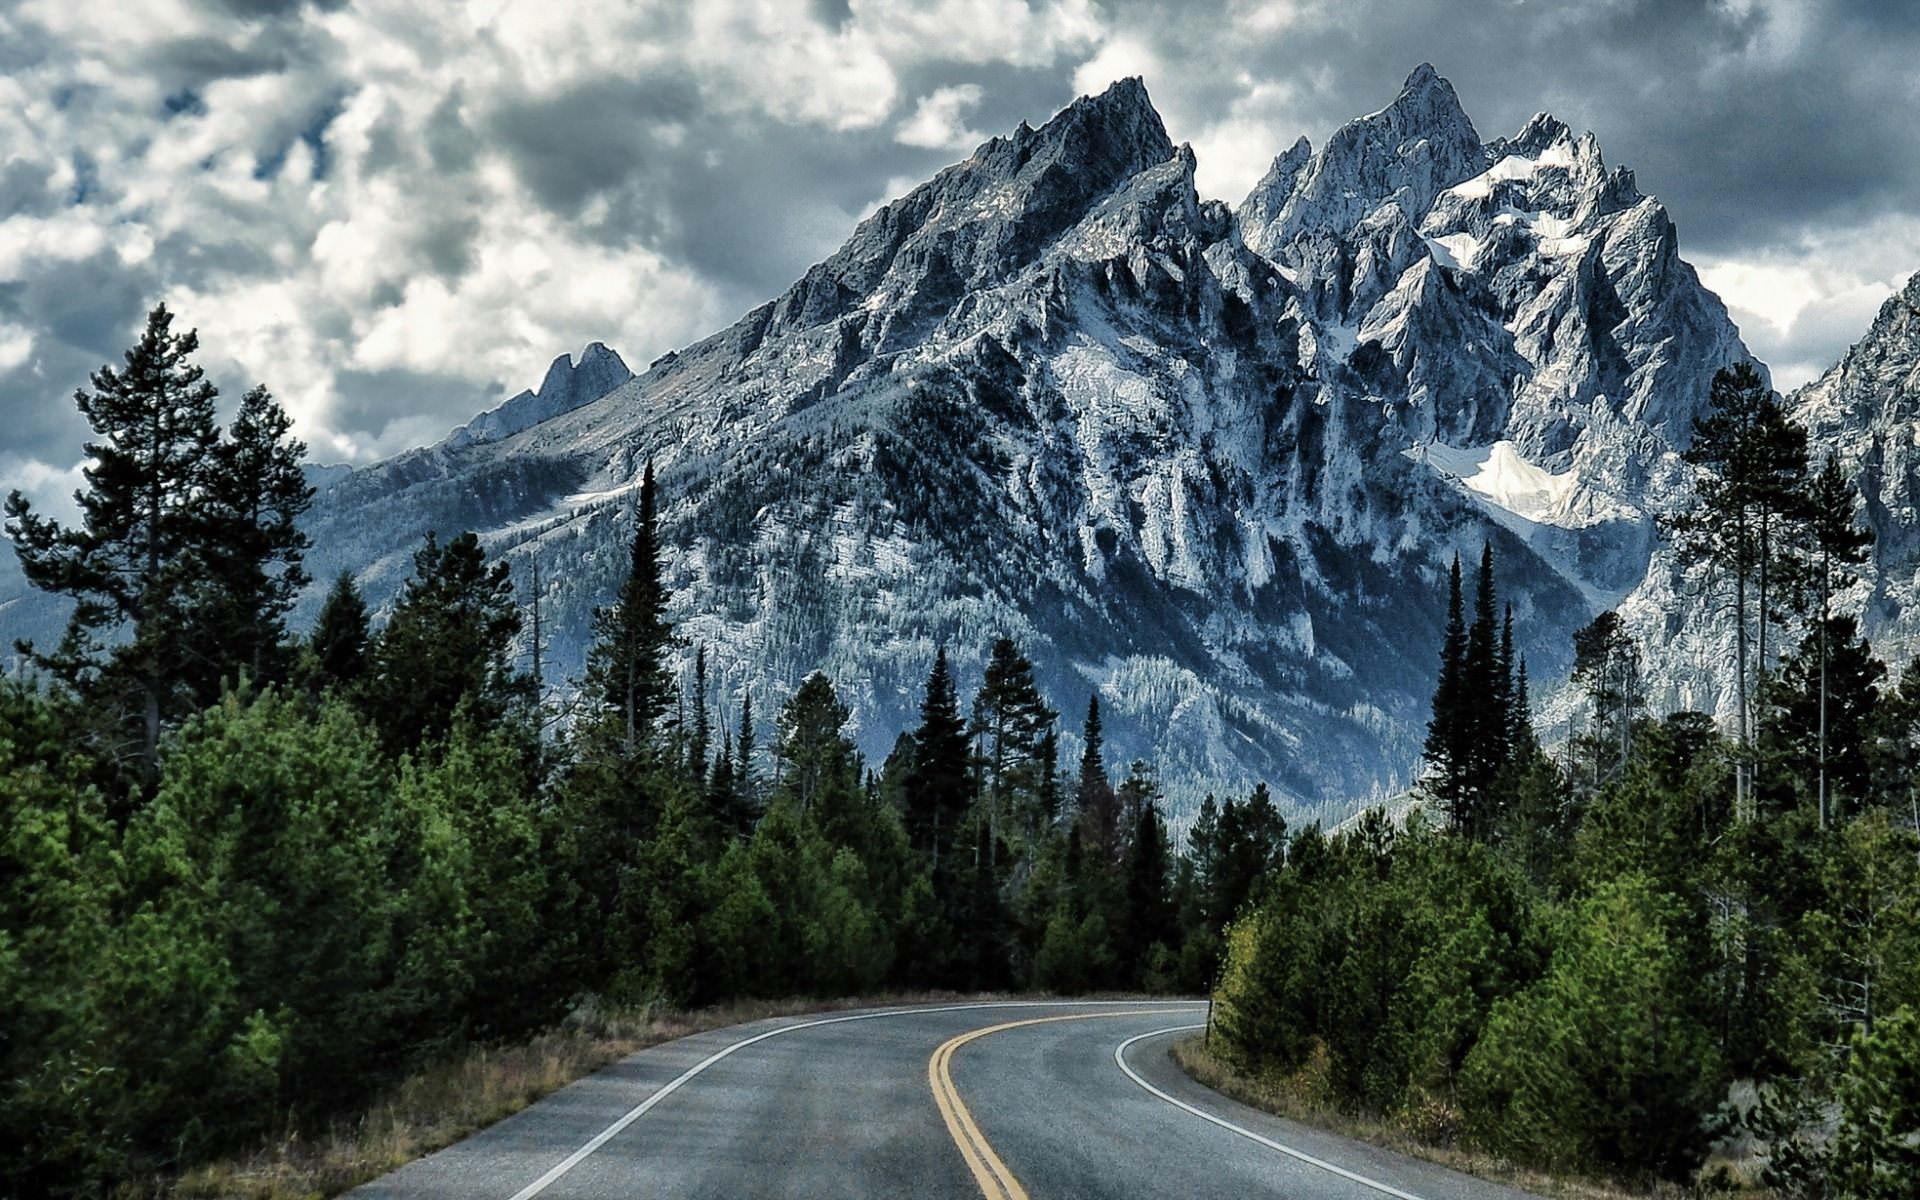 Download Wallpaper Mountain Green - Blue-Mountains-Green-Road-Wallpaper  Graphic_398058.jpg